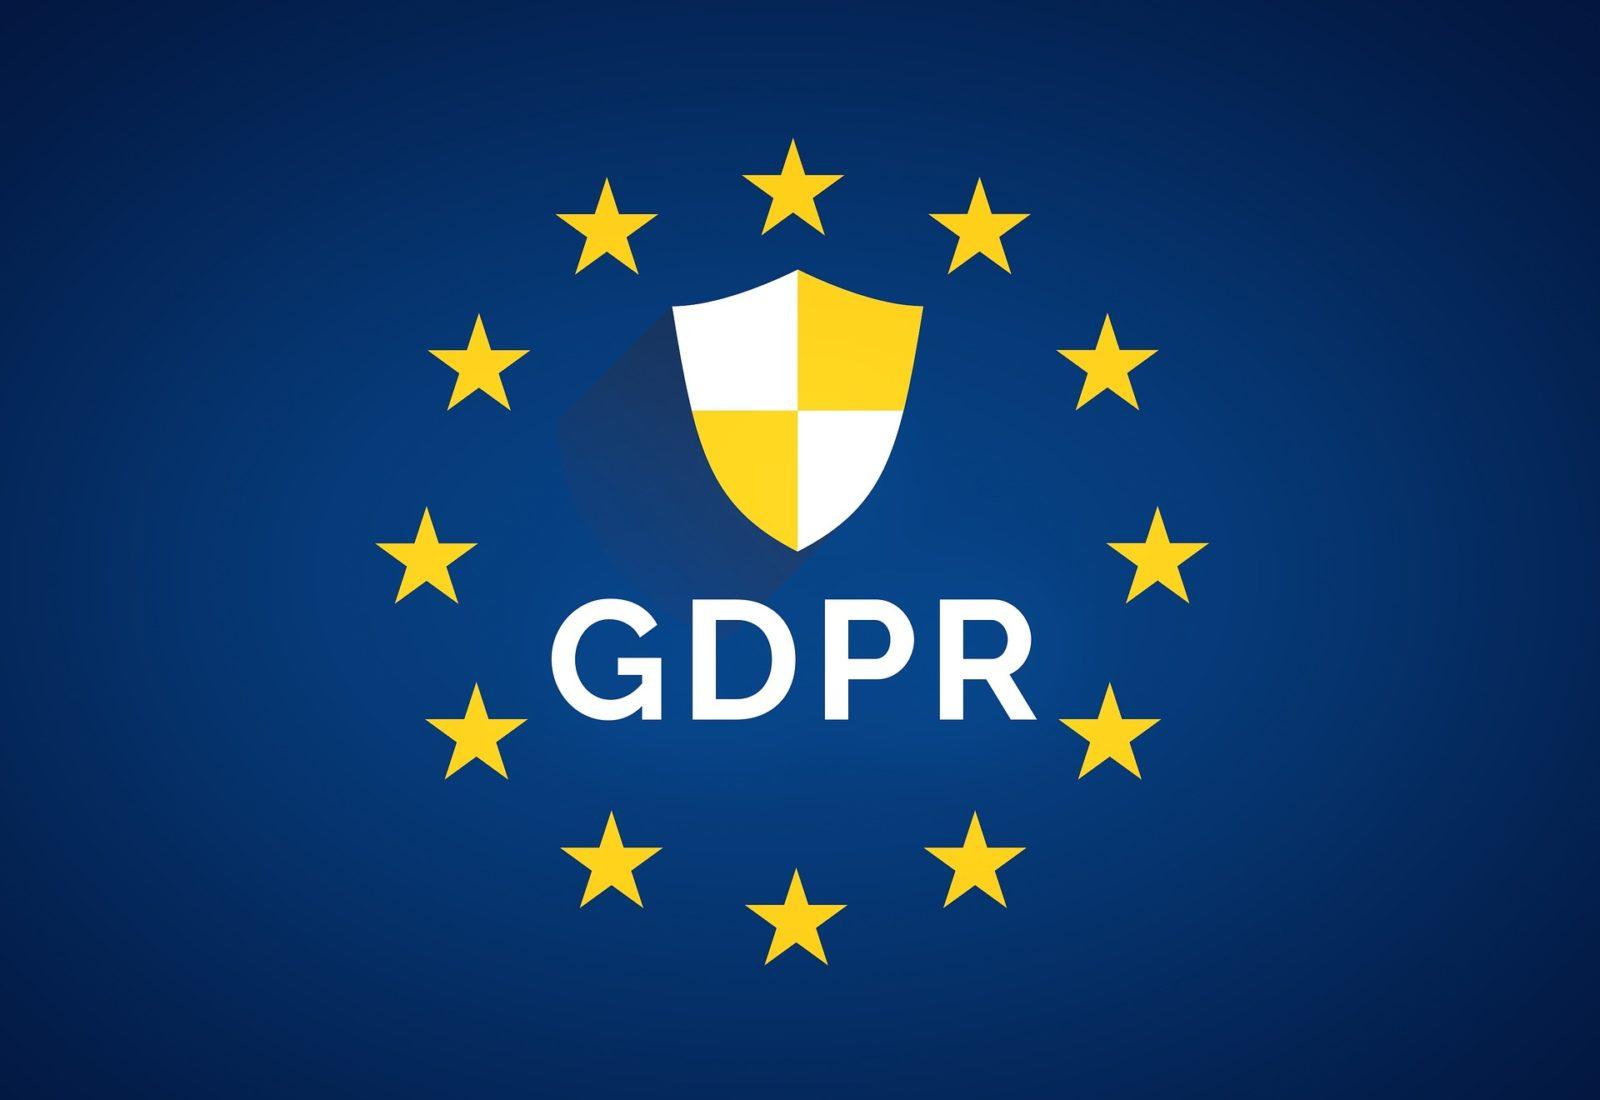 6e9ac335083 GDPR står for The General Data Protection Regulation (GDPR), eller på  dansk: Persondataforordningen. Det primære formål med forordningen er at  beskytte ...